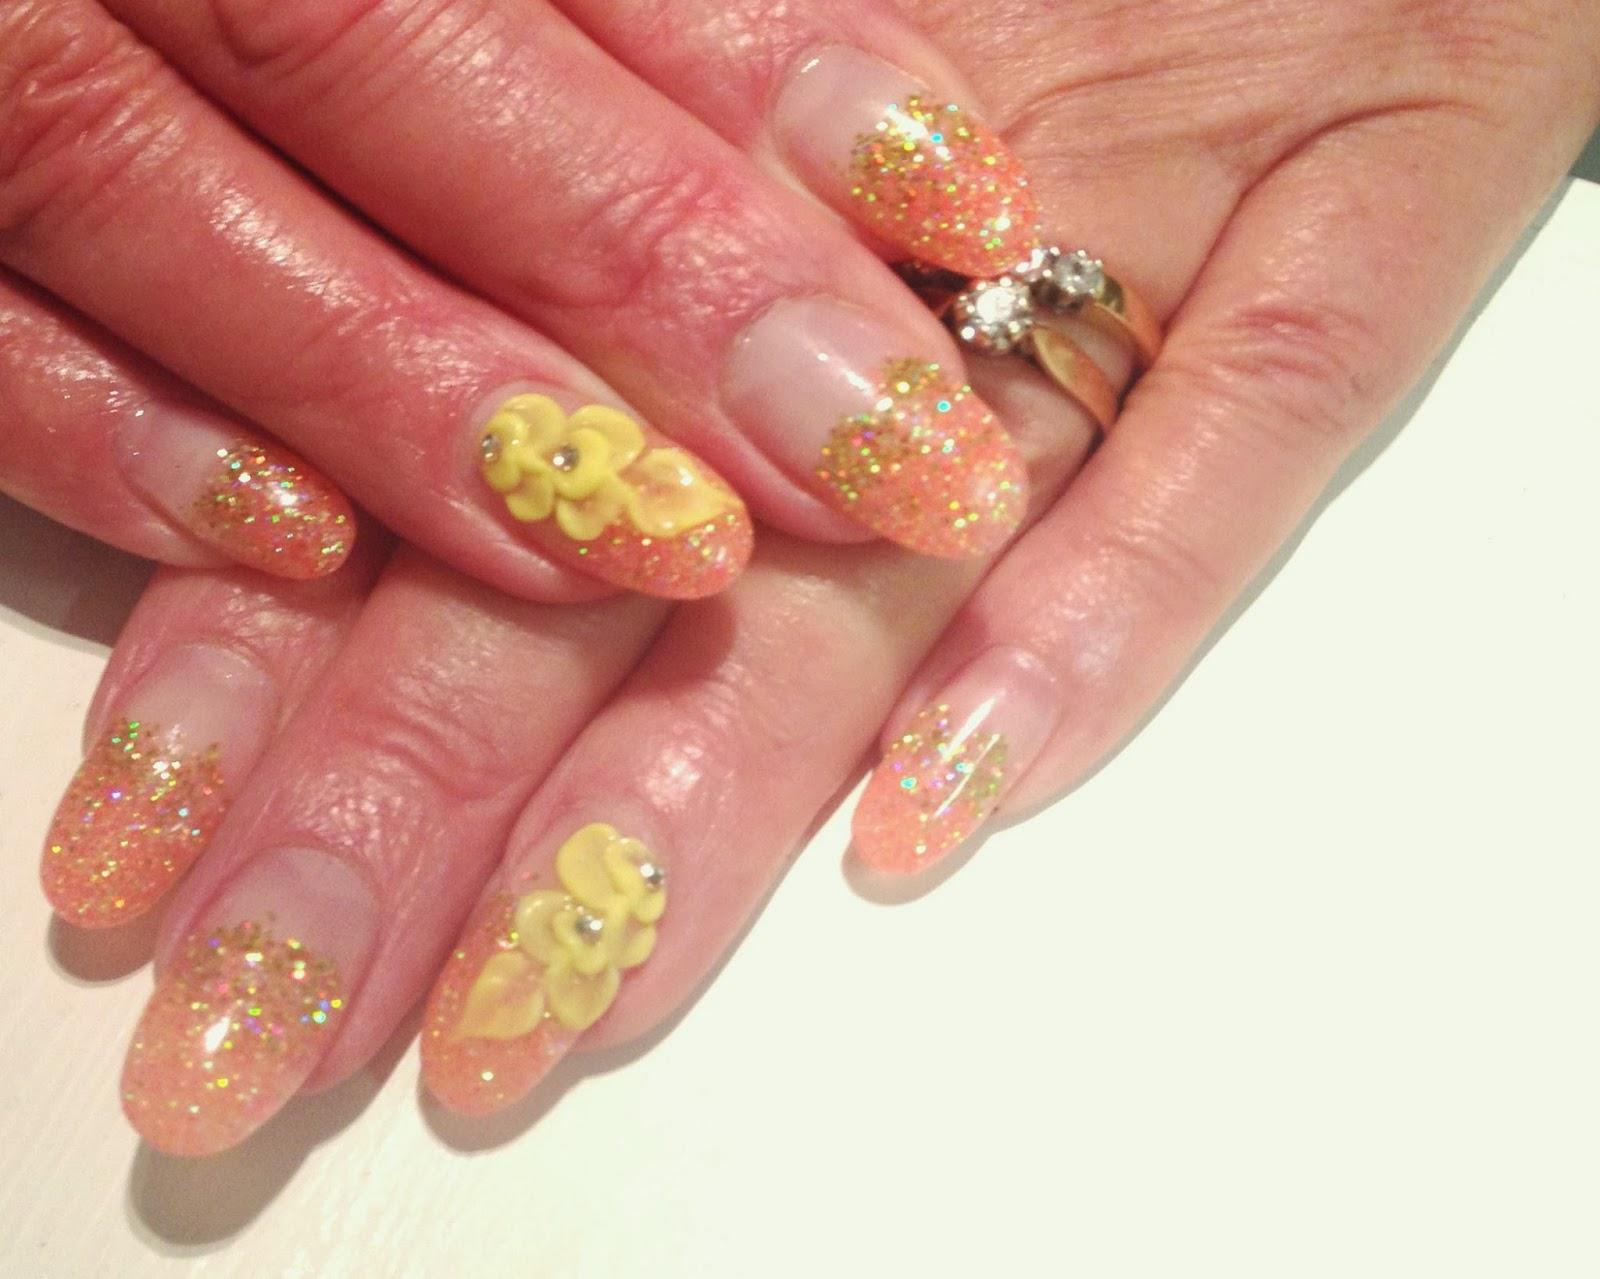 Perfect Infill Acrylic Nails Mold - Nail Art Ideas - morihati.com